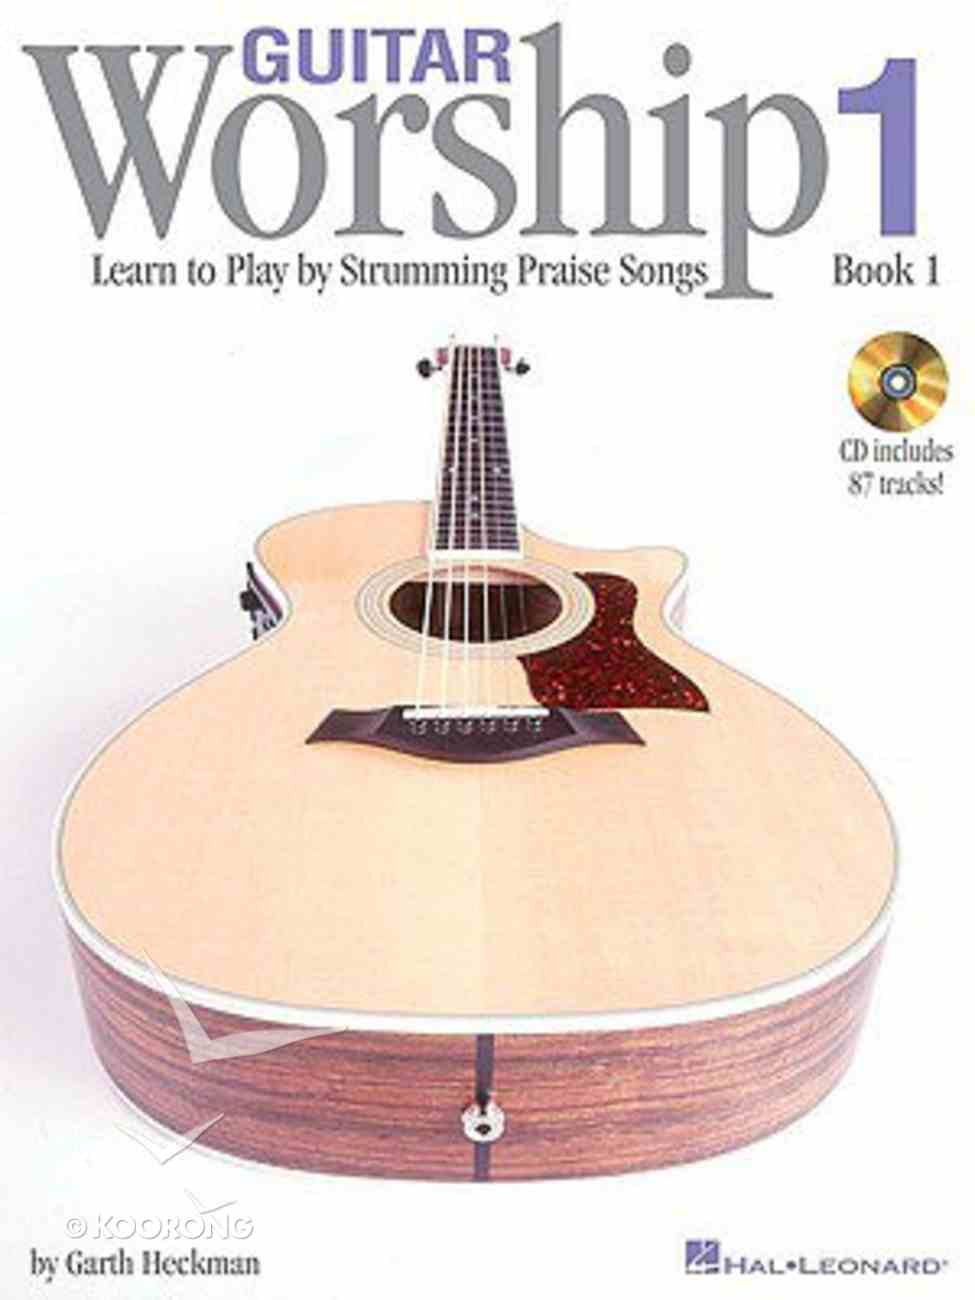 Guitar Worship: Method Book 1 (With Cd) Paperback